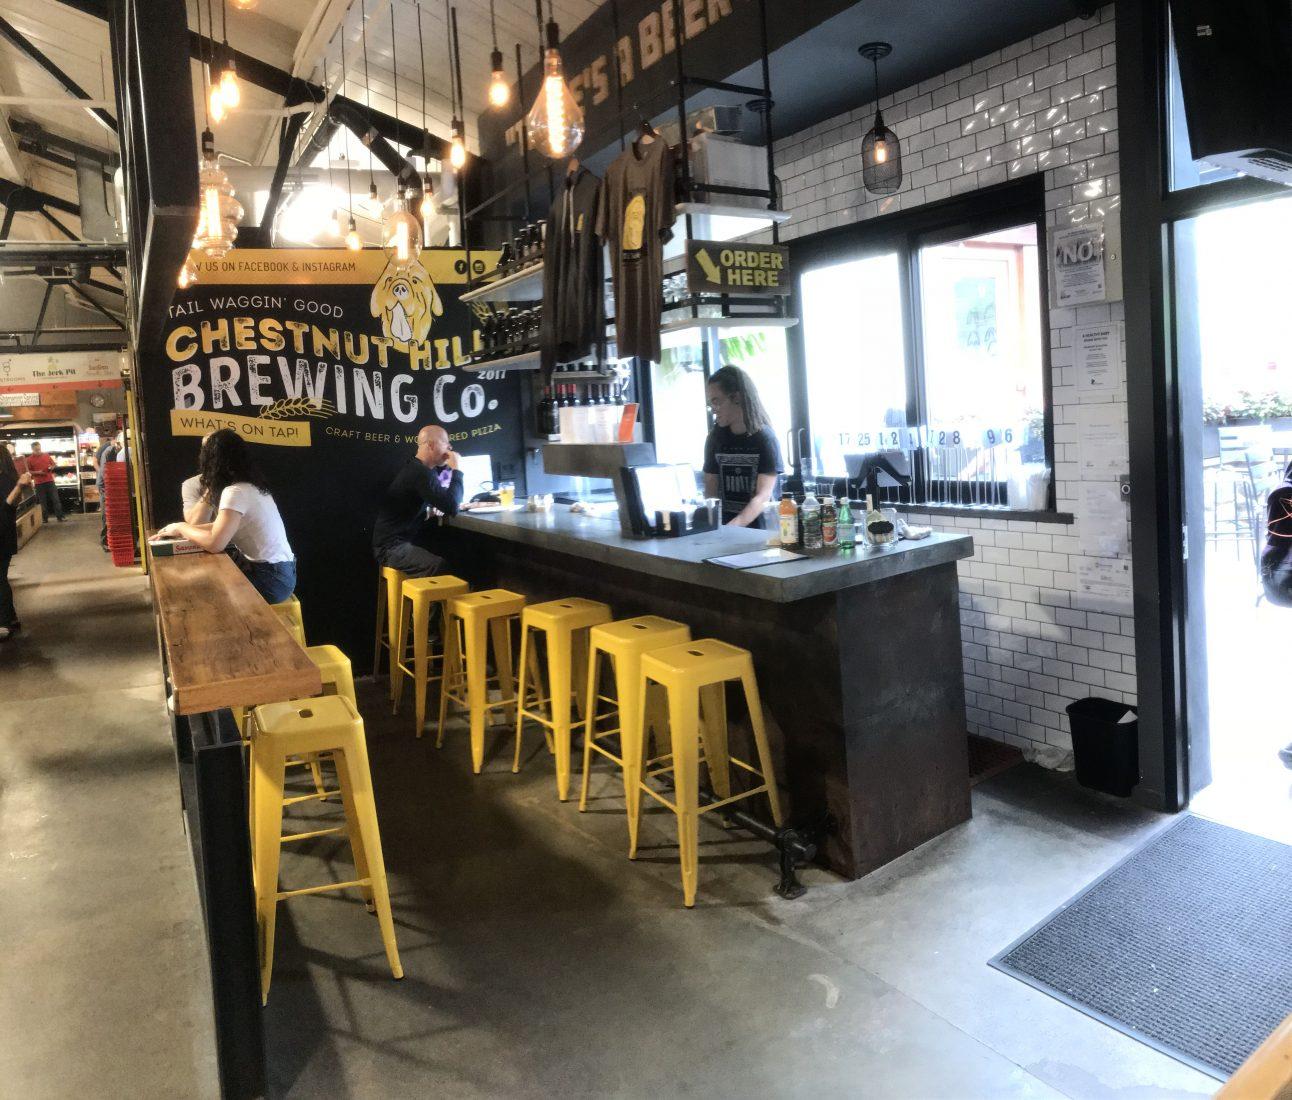 389. Chestnut Hill Brewing Co, Philadelphia PA, 2018